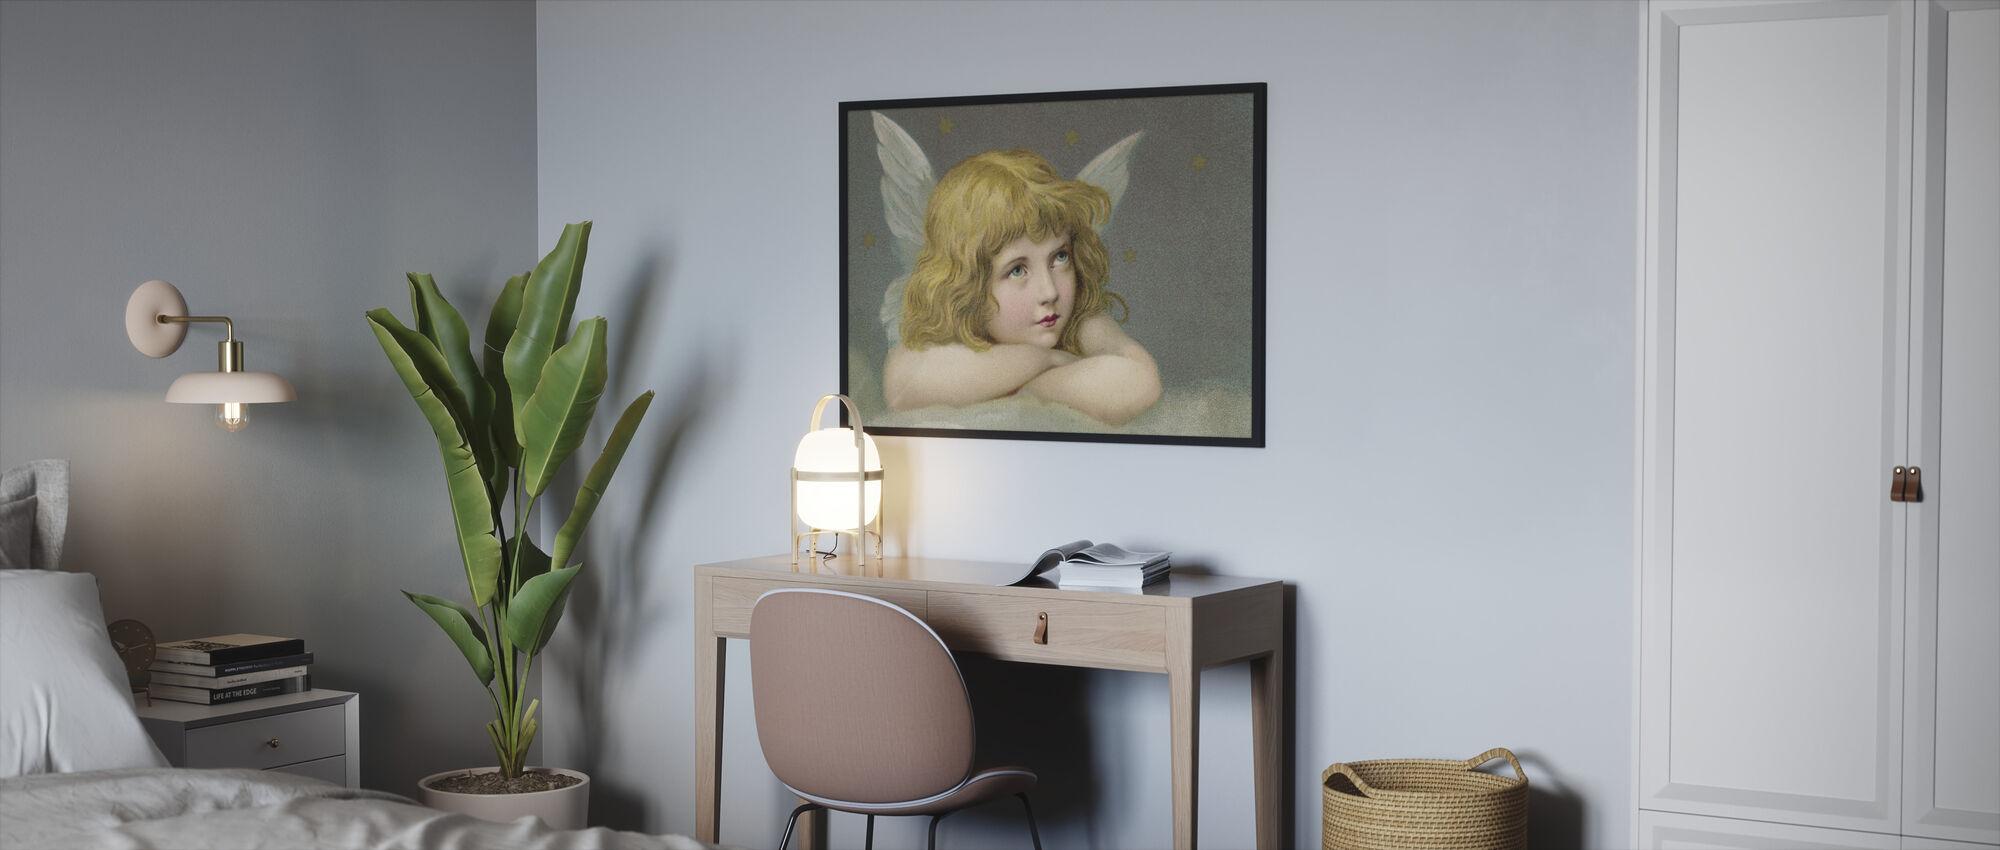 Kleine Engel - Ingelijste print - Slaapkamer